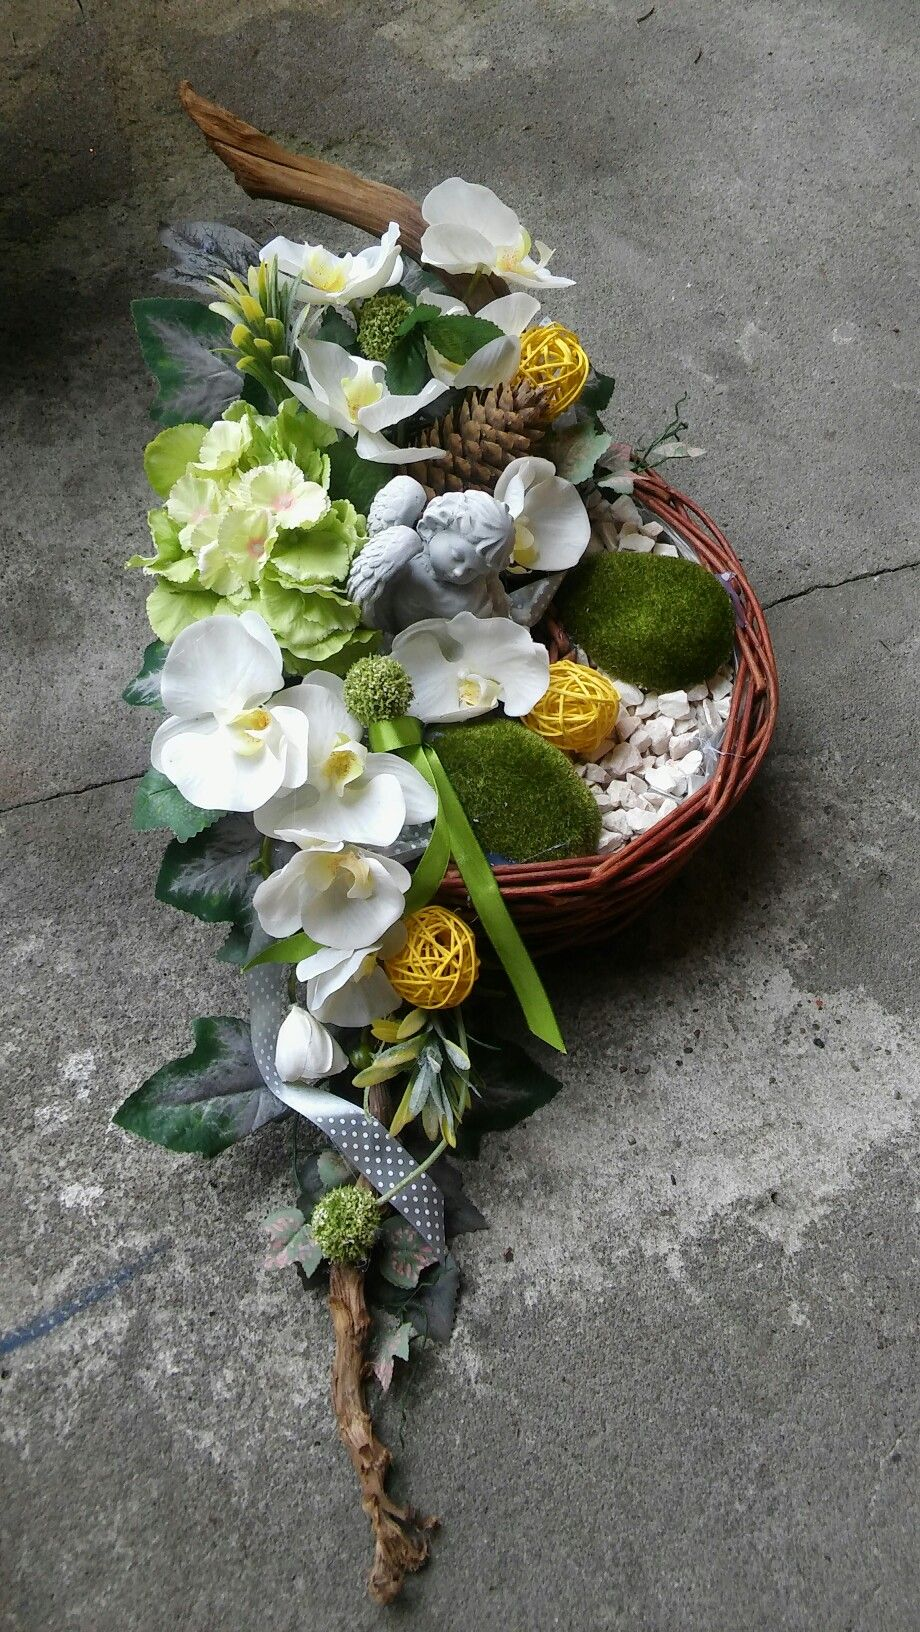 Pin By Karolina Szymon Robak On Stroiki Funeral Flower Arrangements Easter Flower Arrangements Funeral Flowers